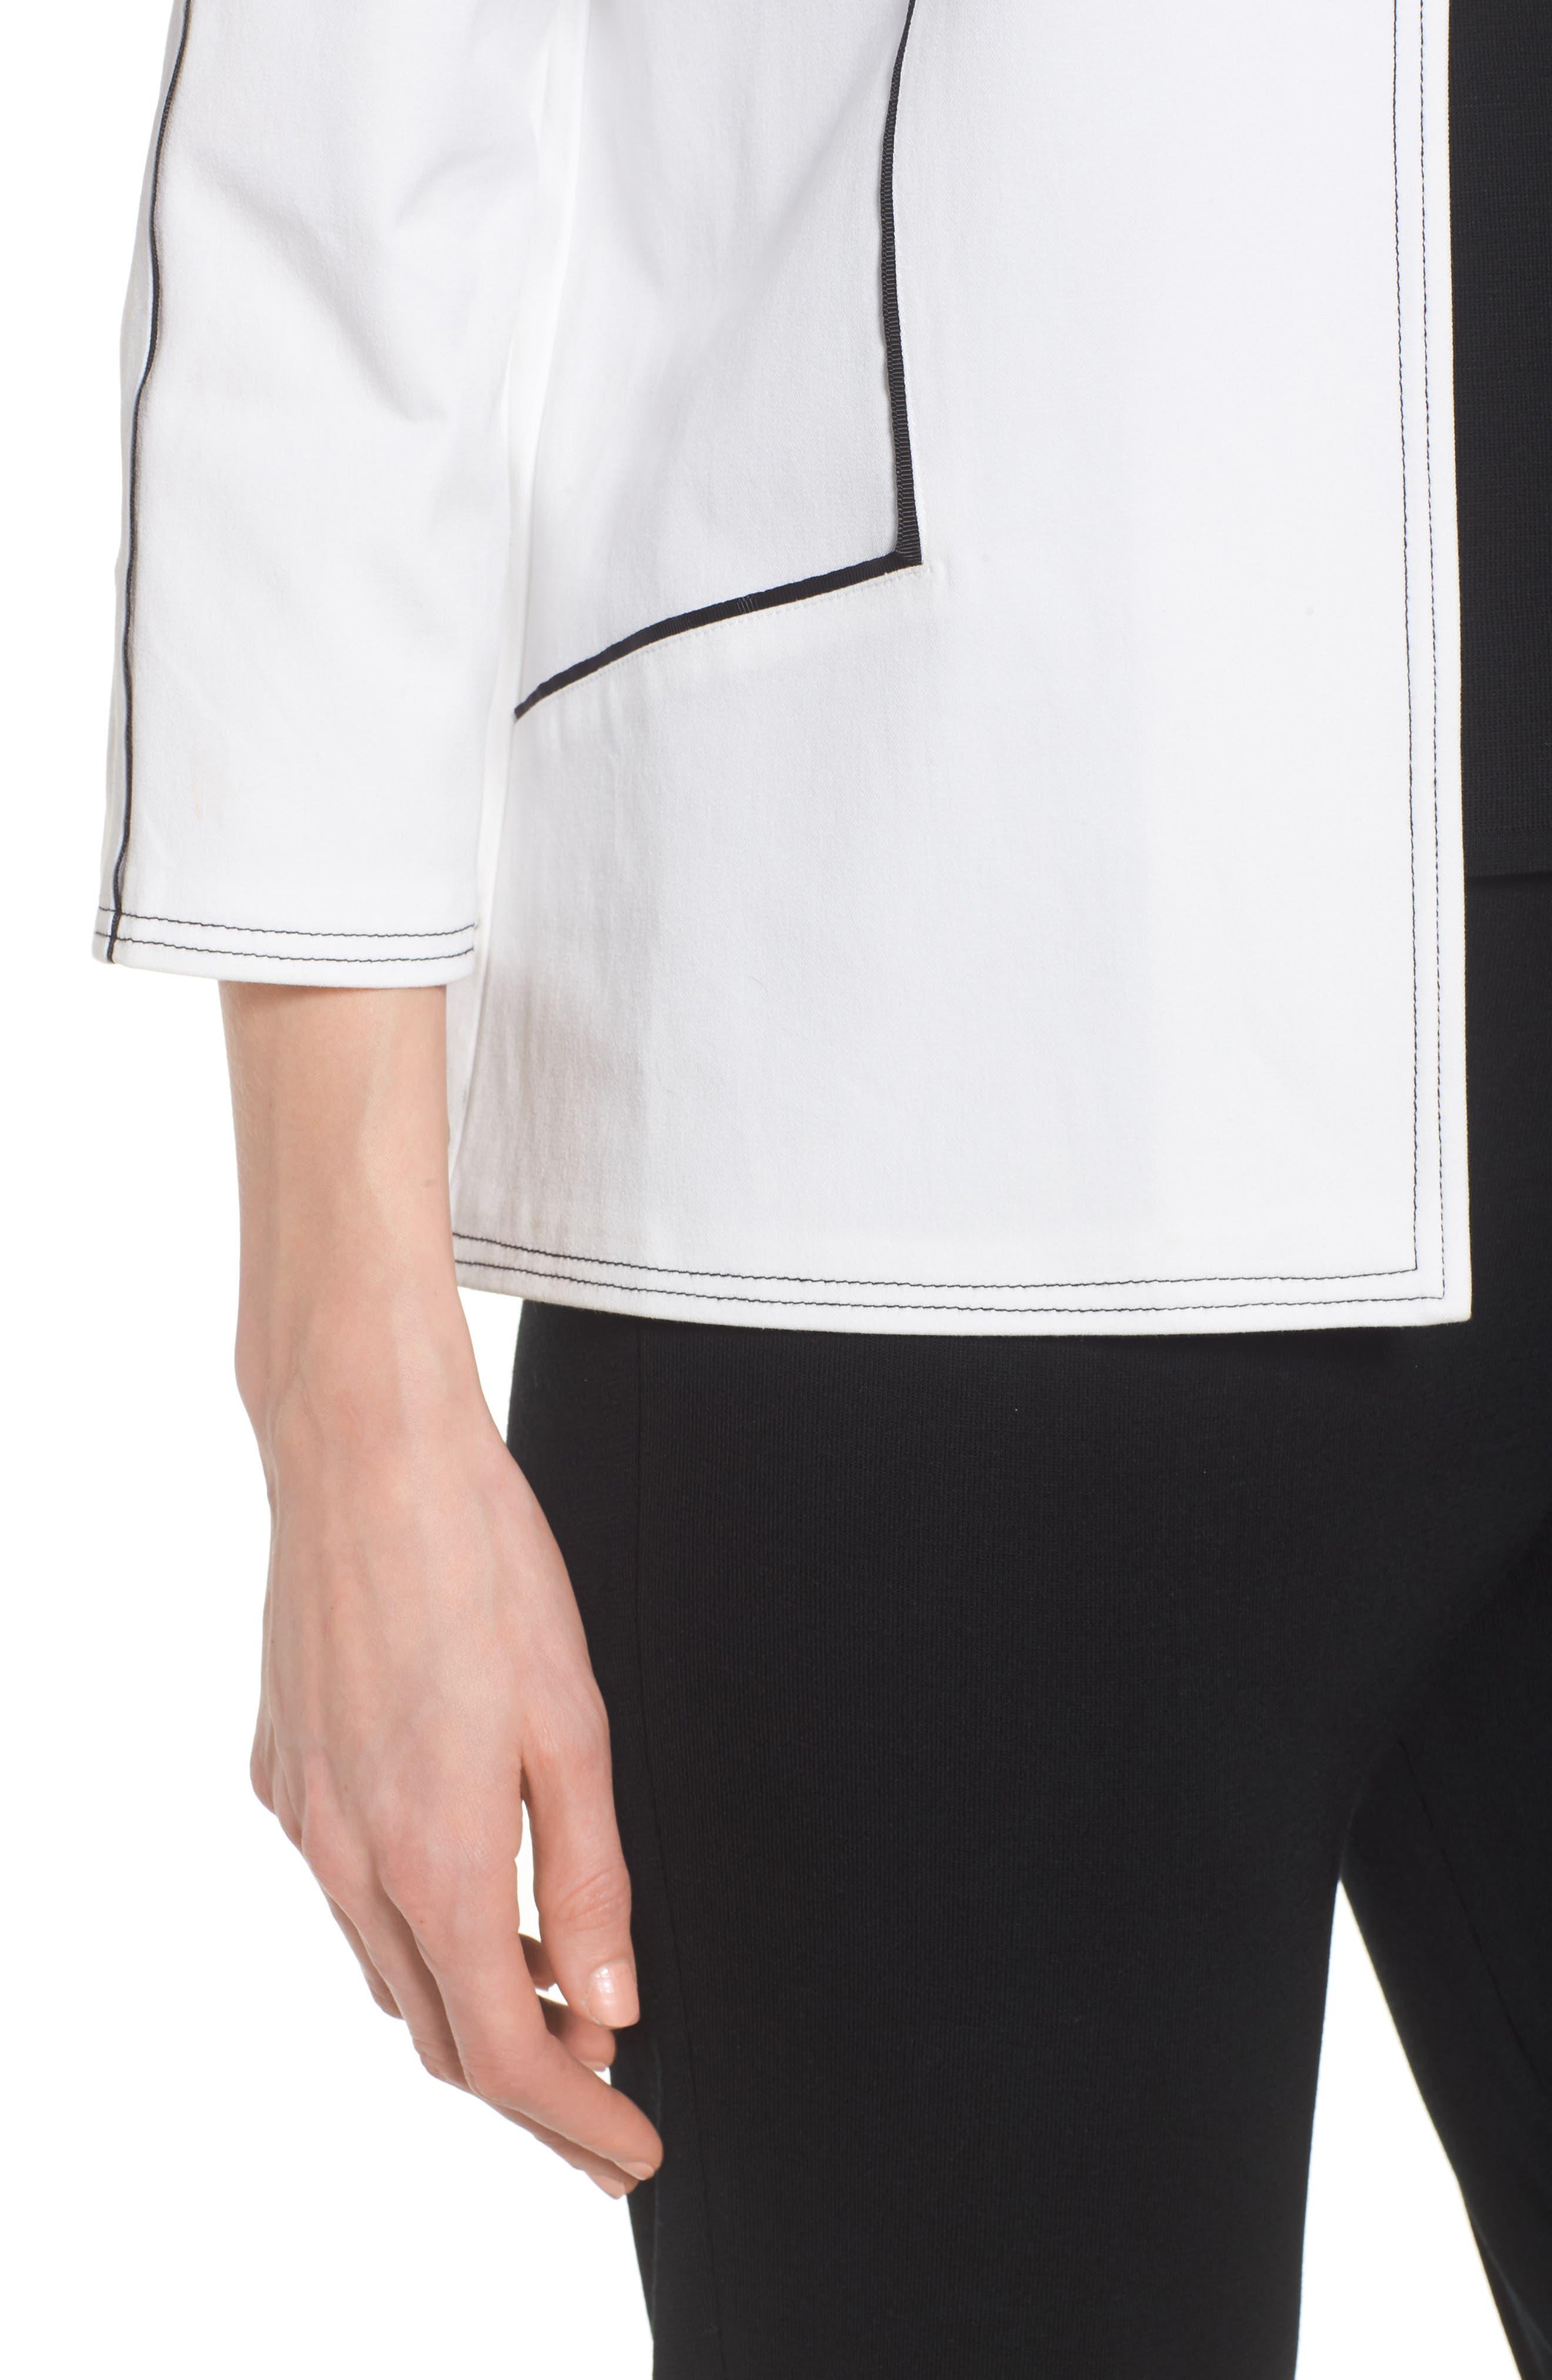 Mandarin Collar Stitch Trim Jacket,                             Alternate thumbnail 4, color,                             White/ Black